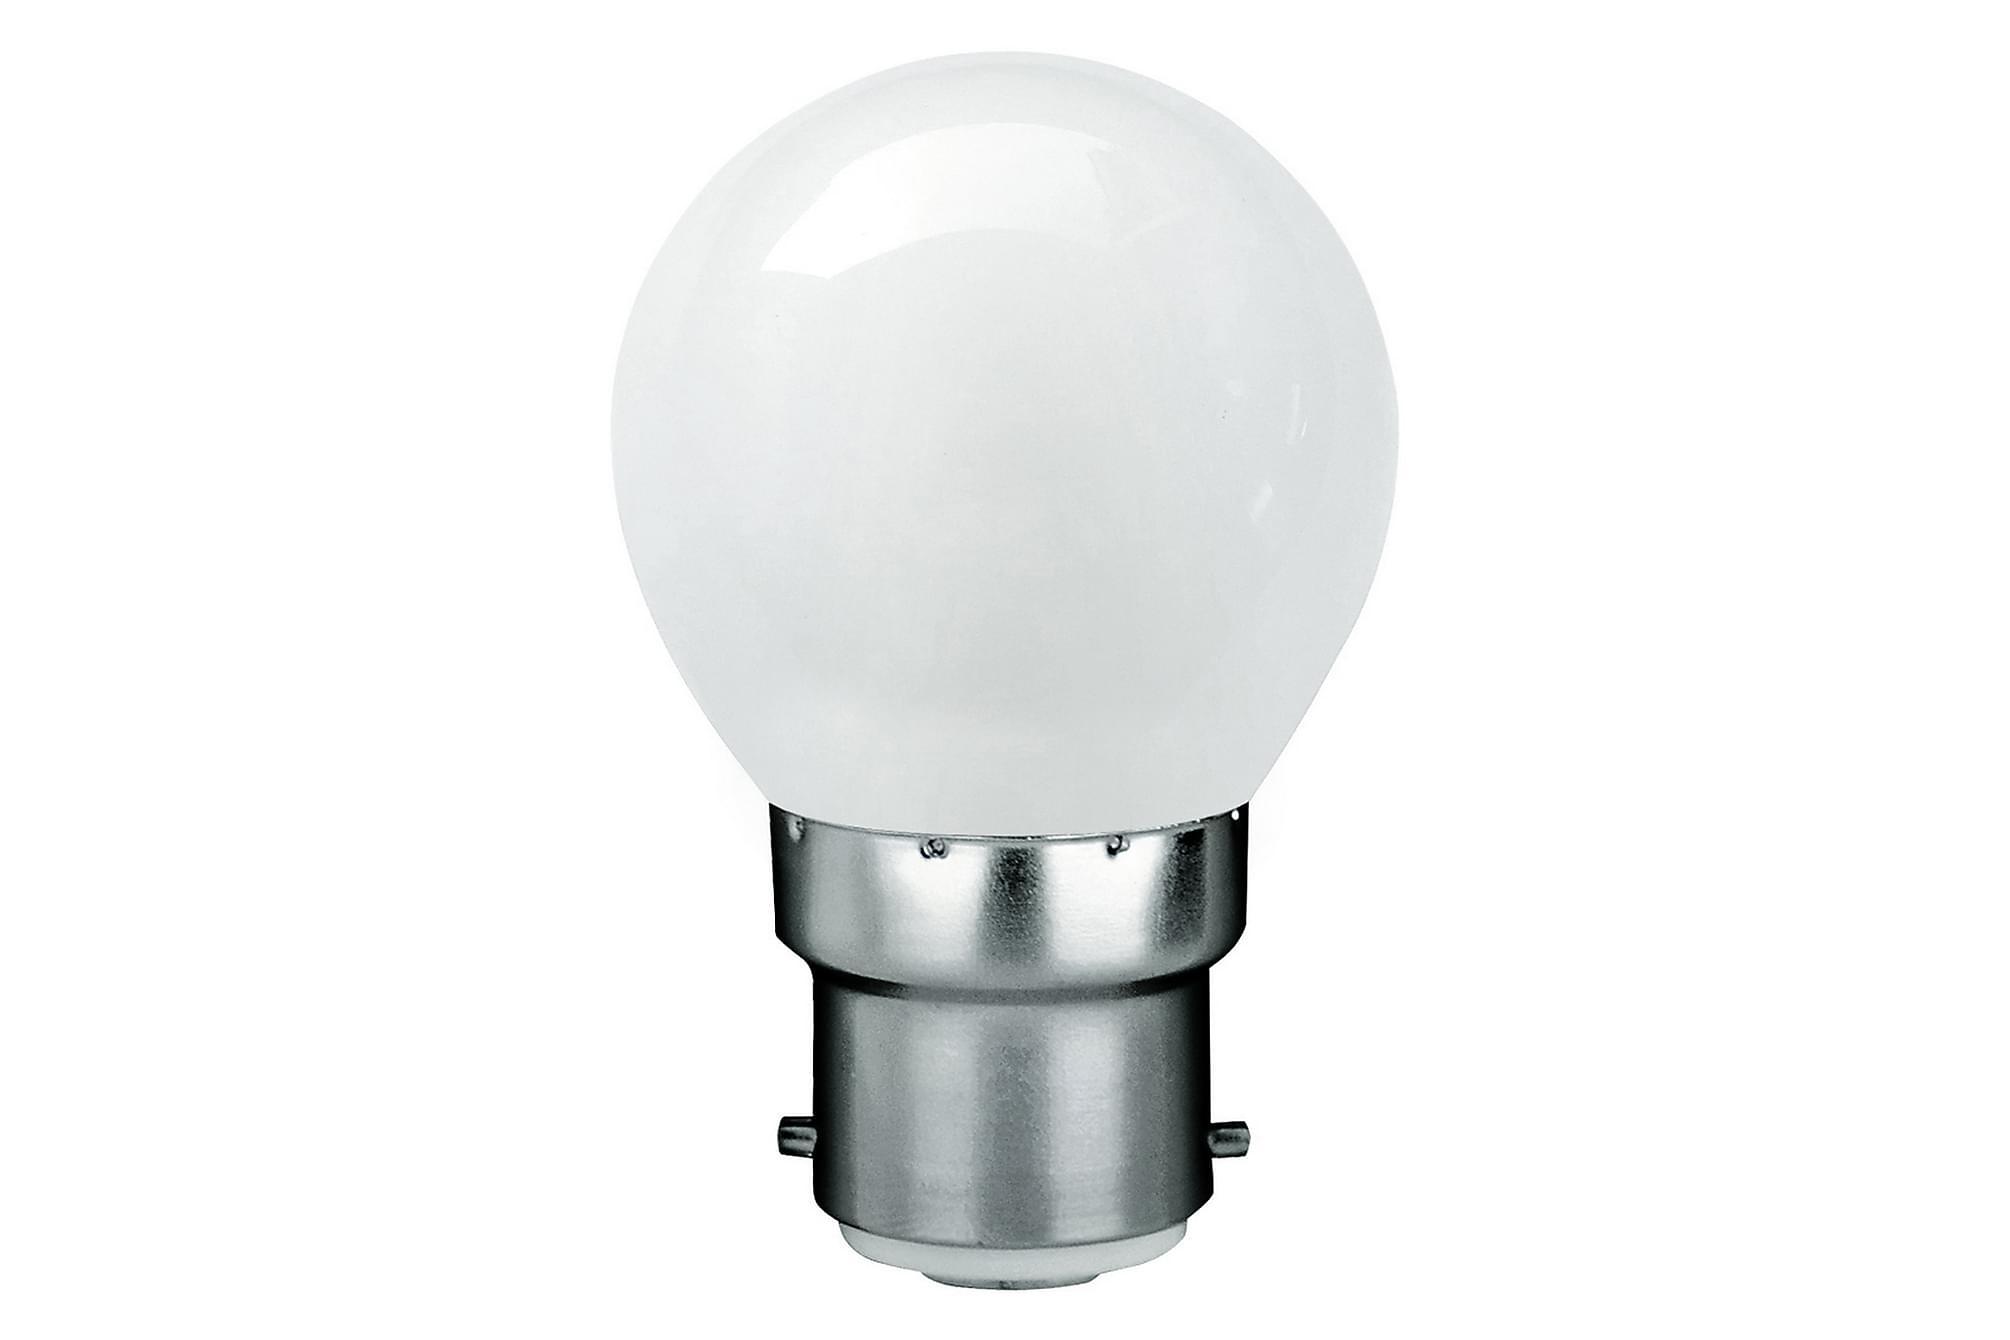 KIBBLE LED-lampa 1,8W B22 2700K Filament Opal, Glödlampor & ljuskällor